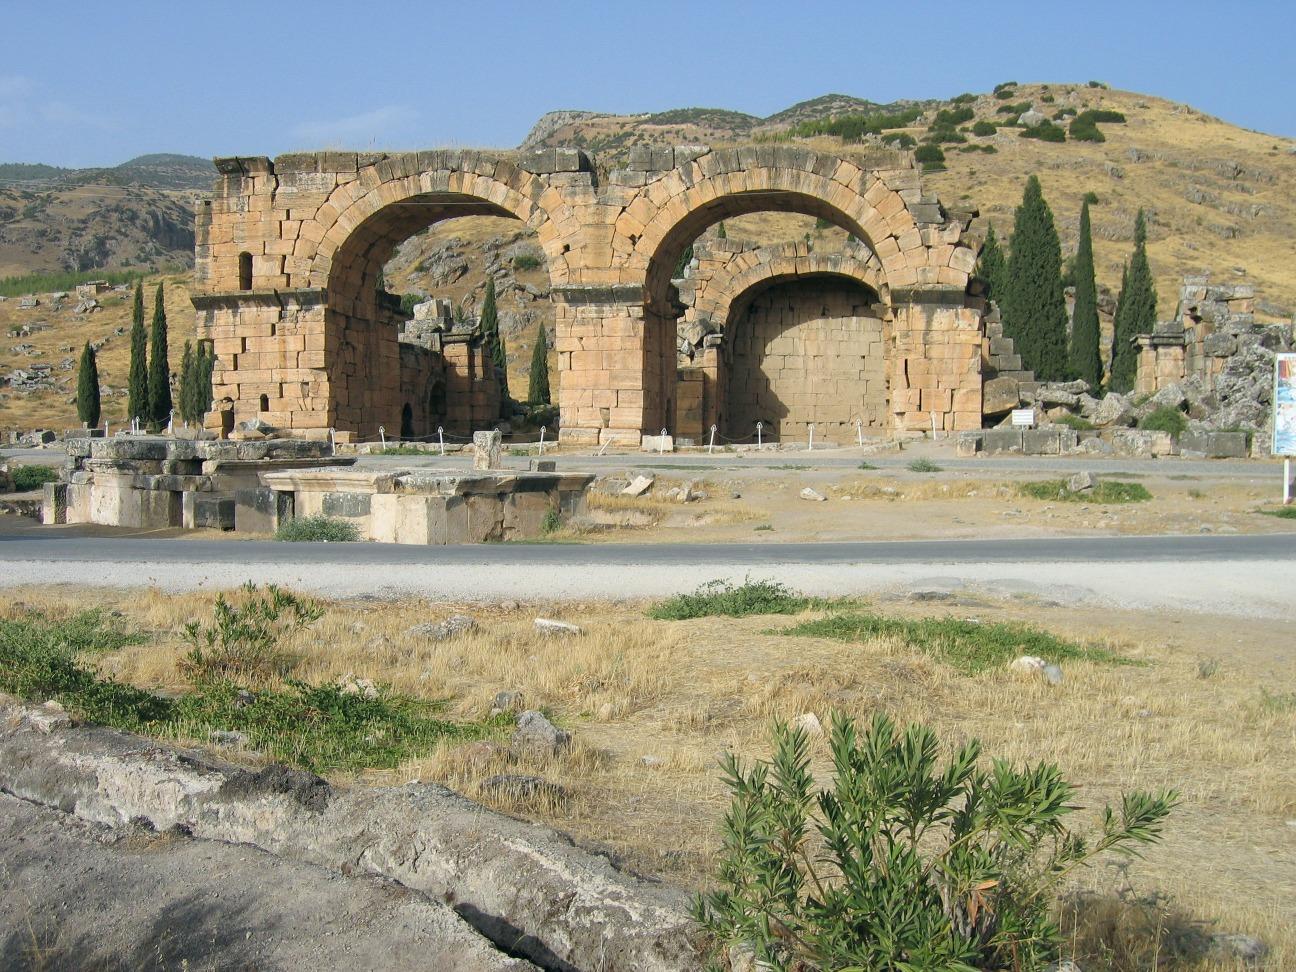 Hierapolis-Pamukkale - Sights